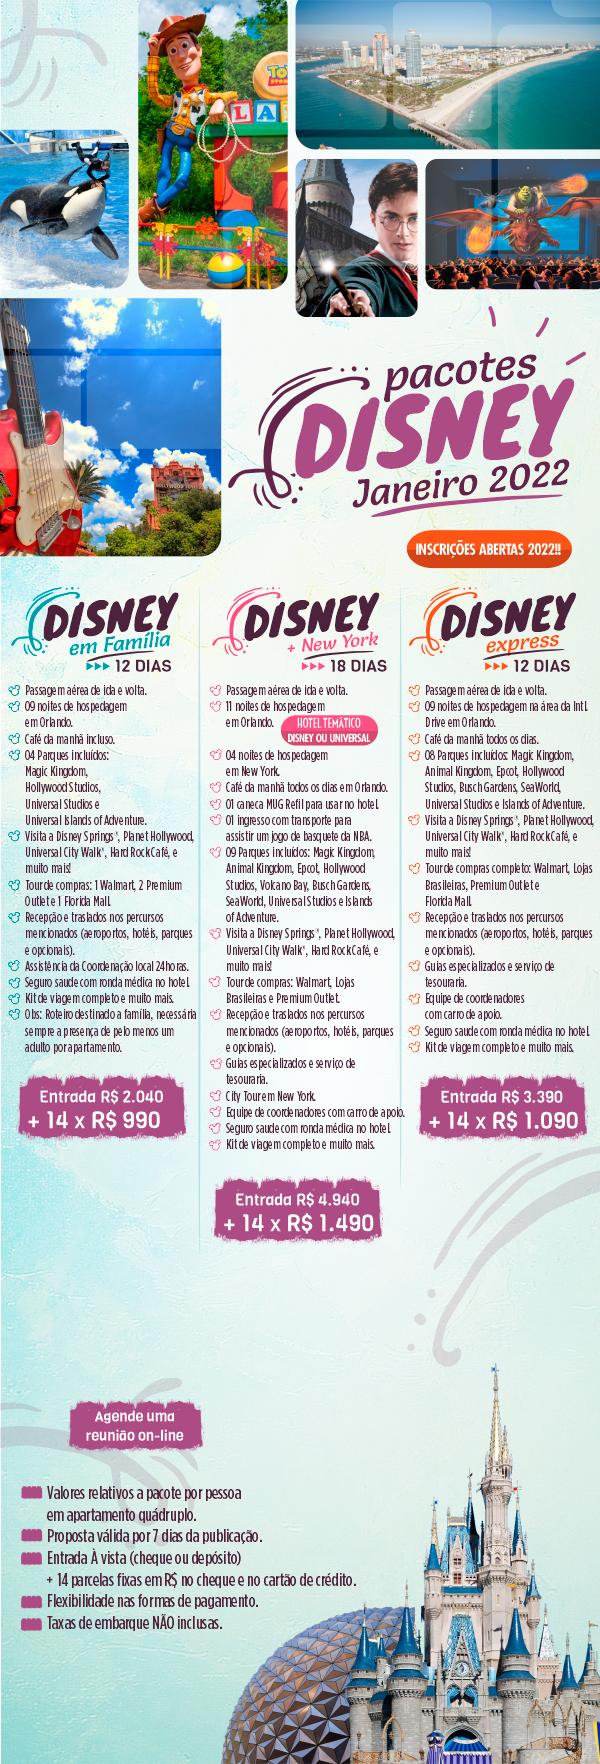 Disney + NYC